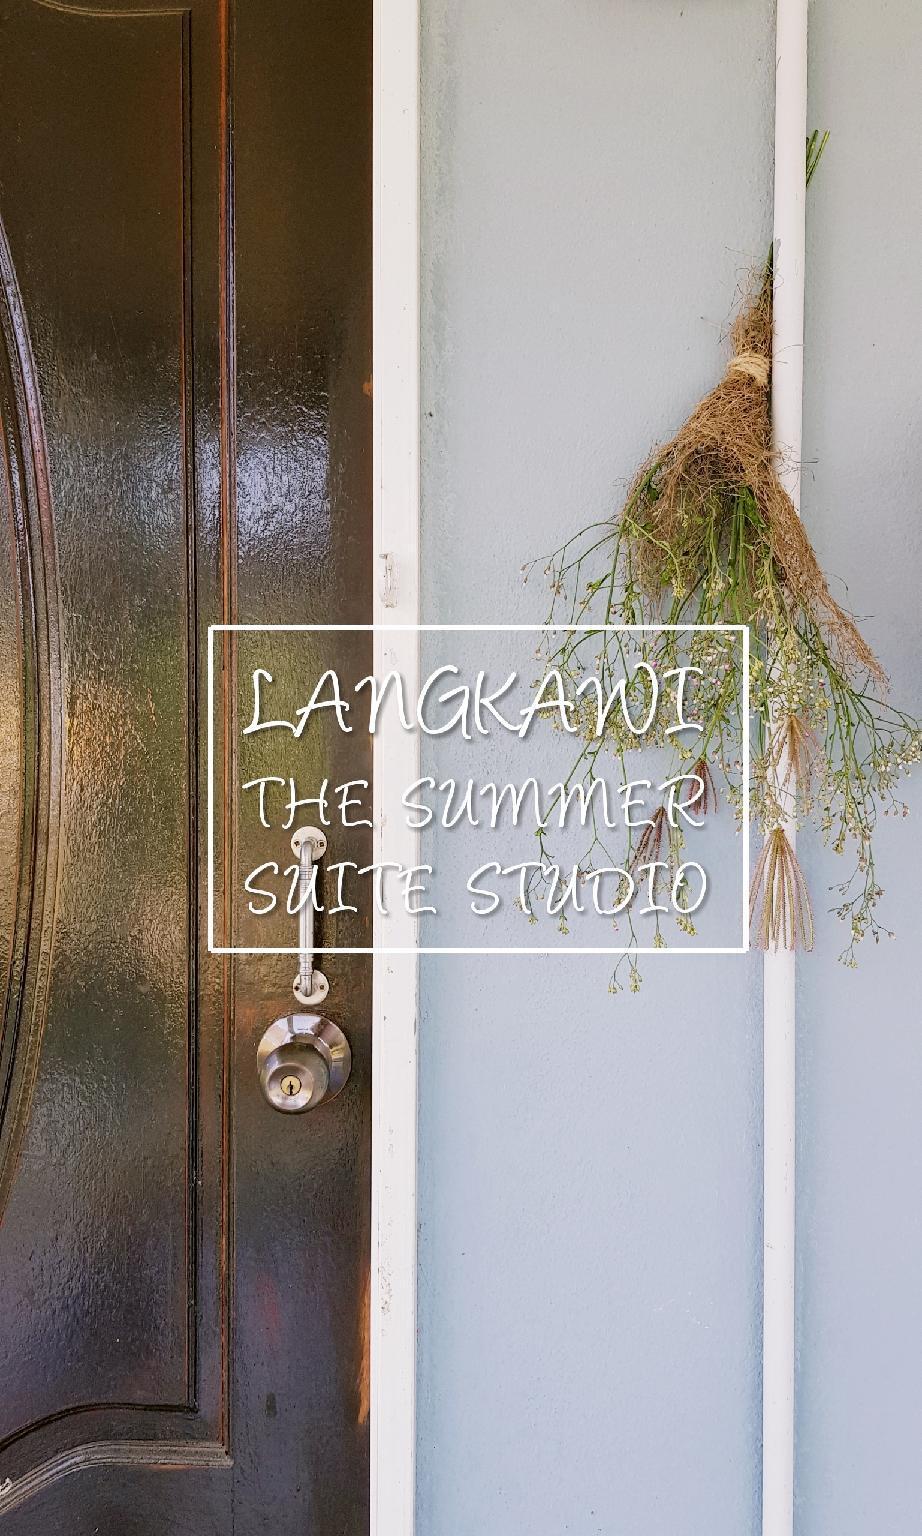 LANGKAWI SUMMER SUITES STUDIOS